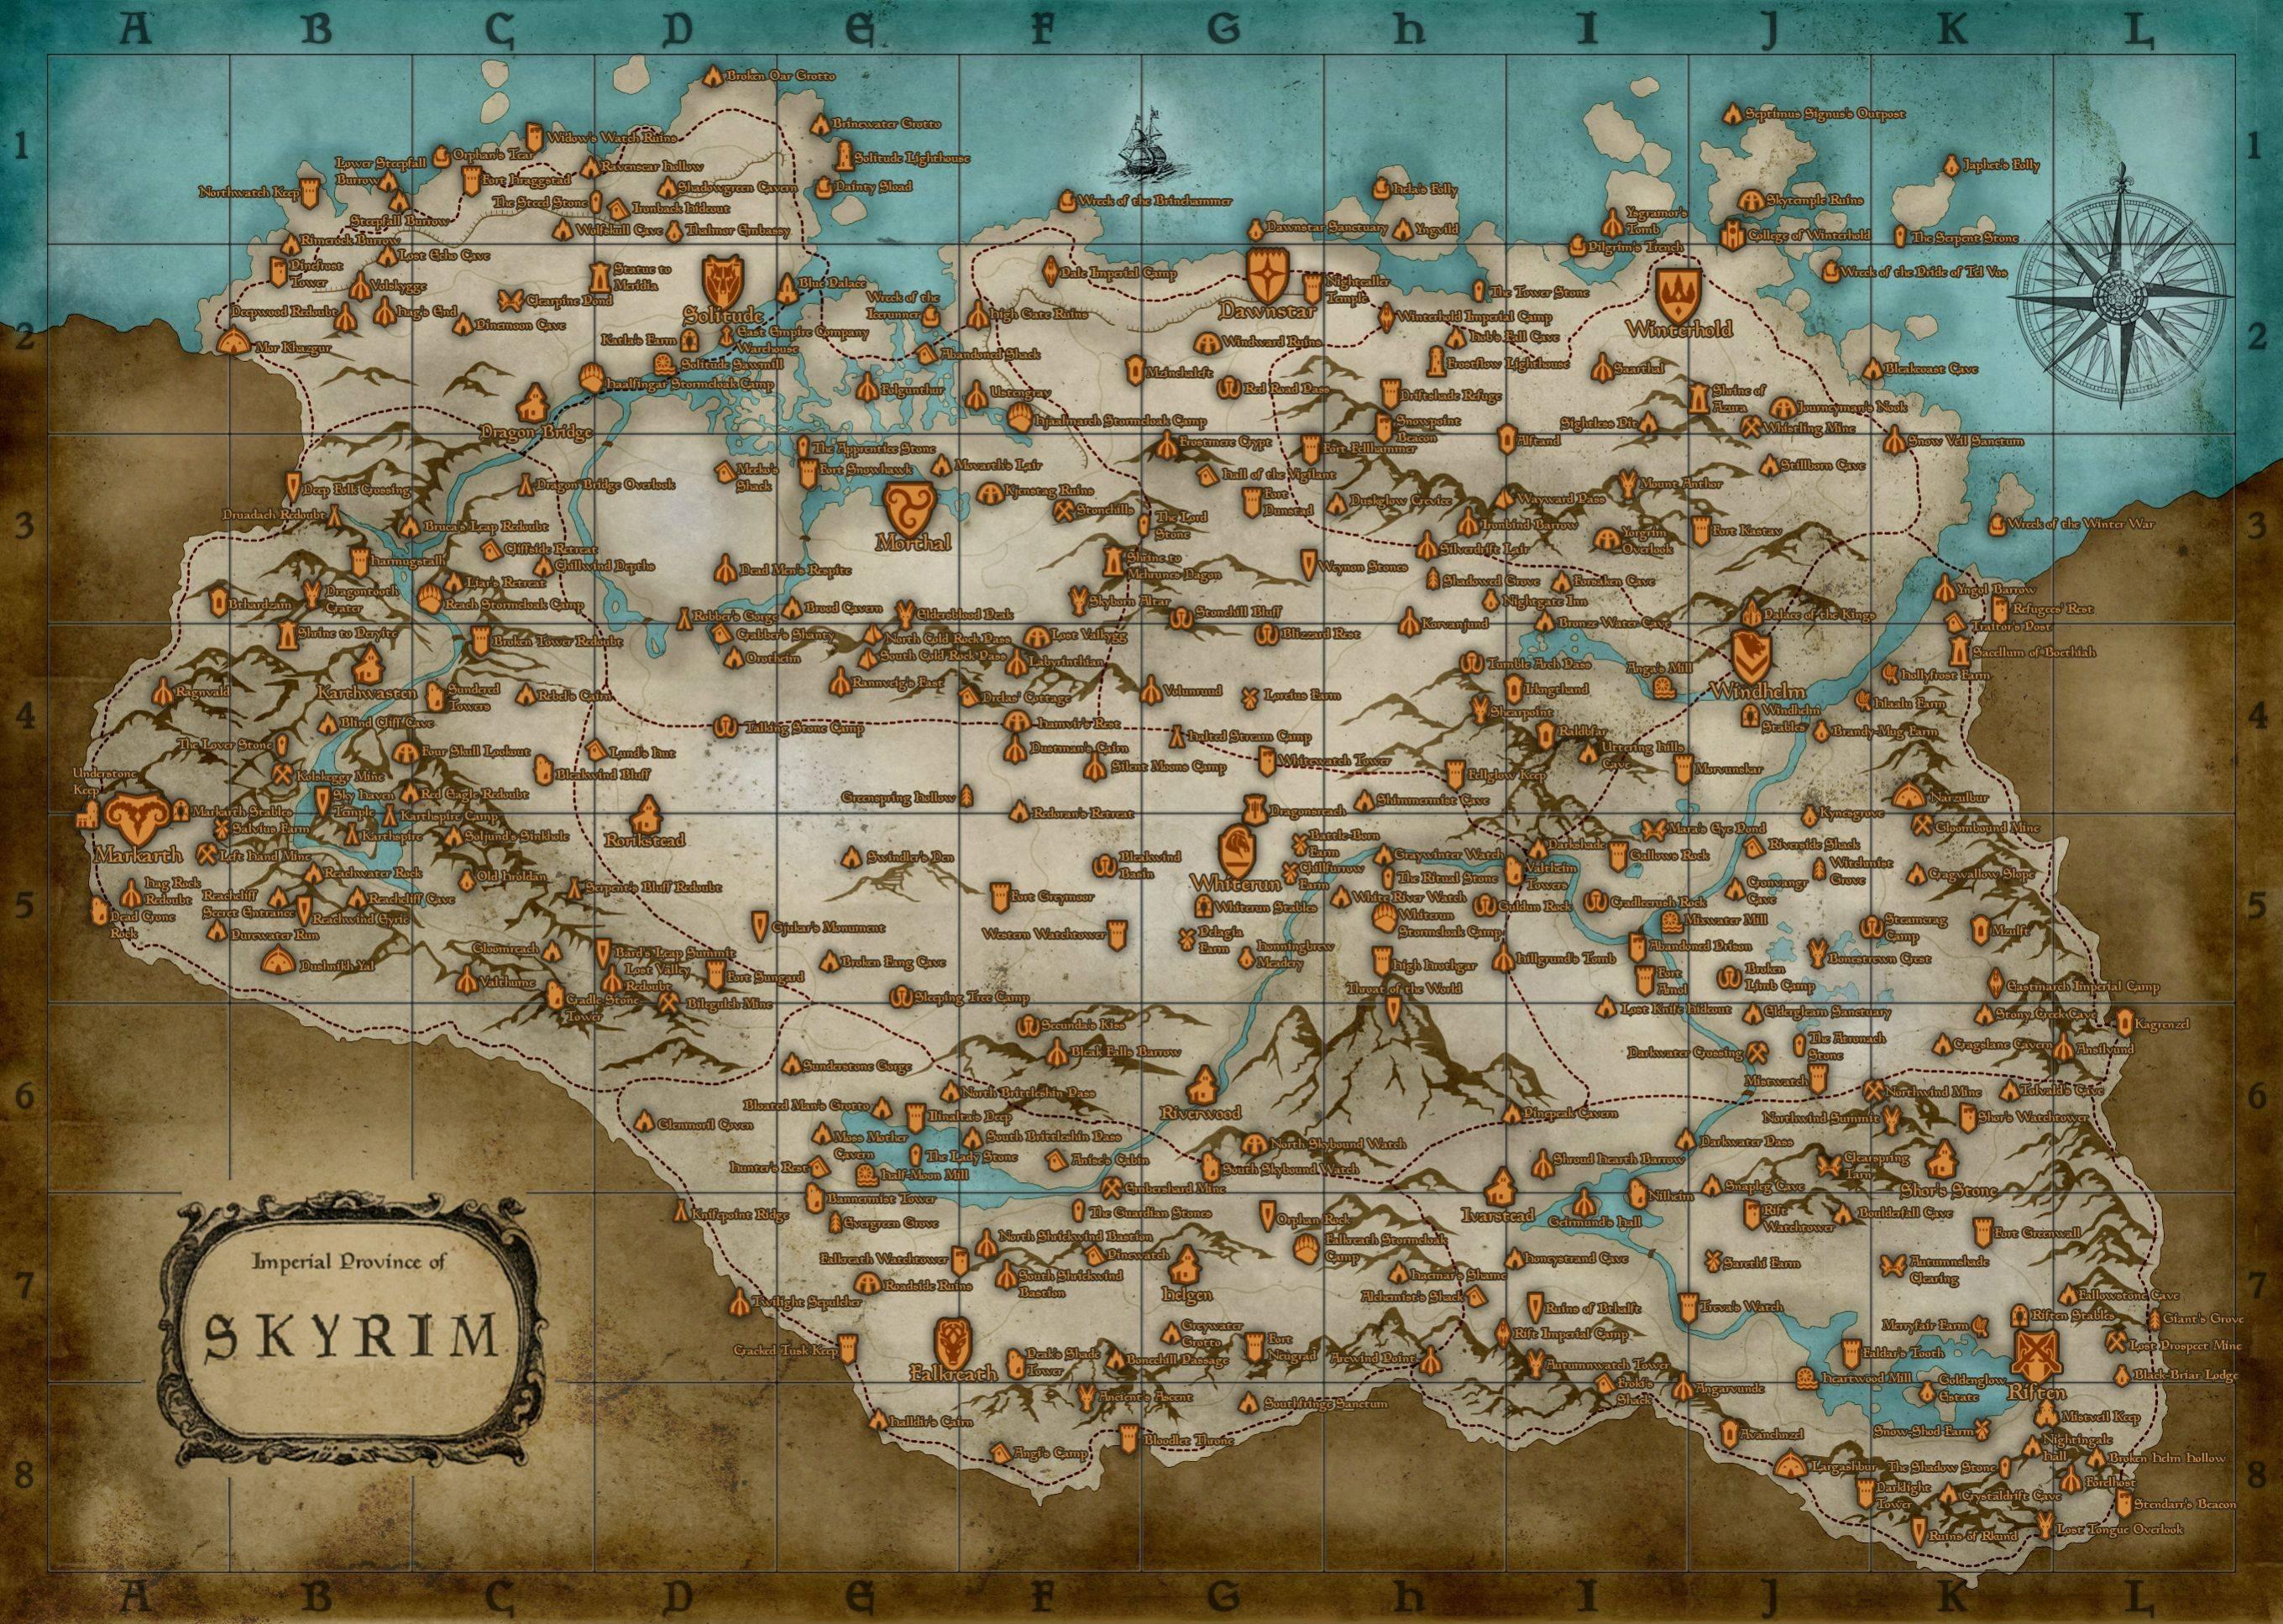 skyrim map wallpaper (1900x1080) : skyrim